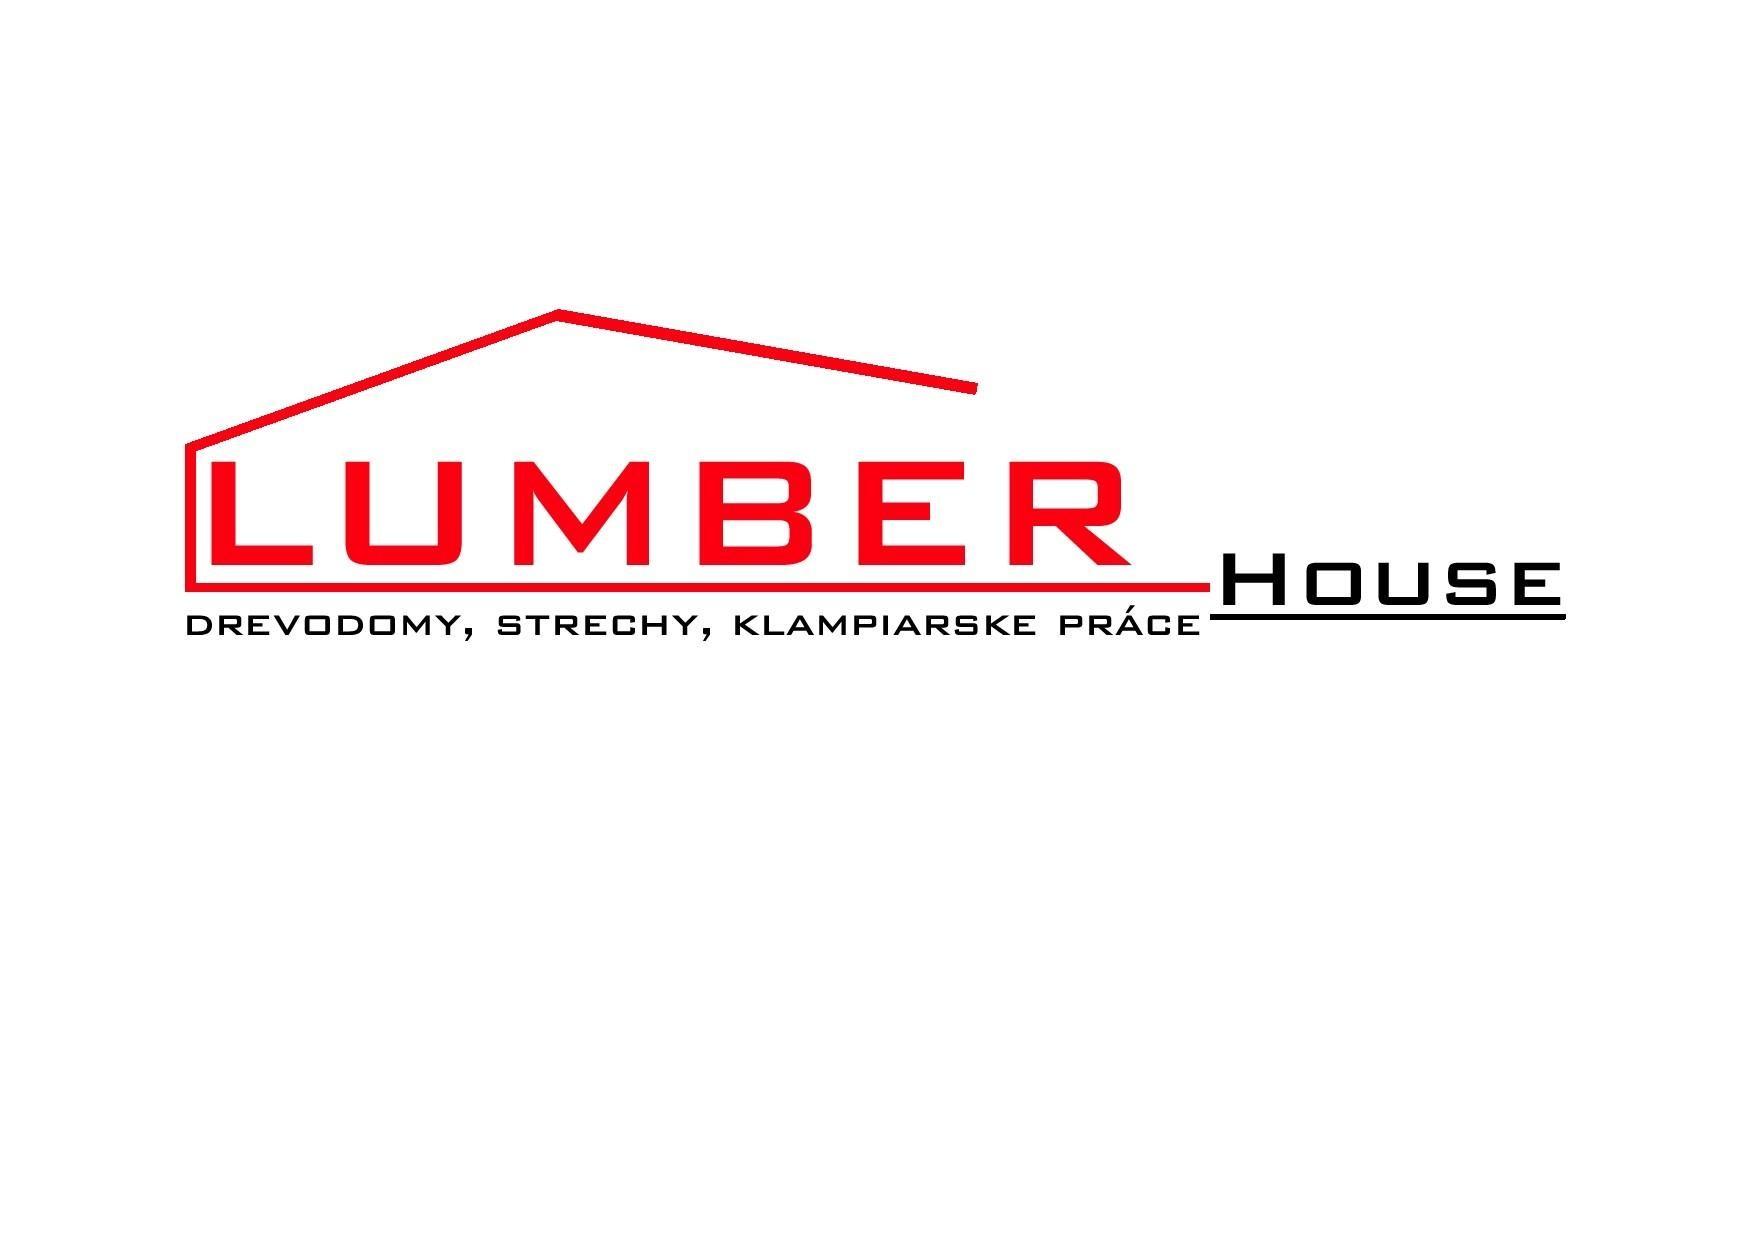 Lumber HOUSE logo